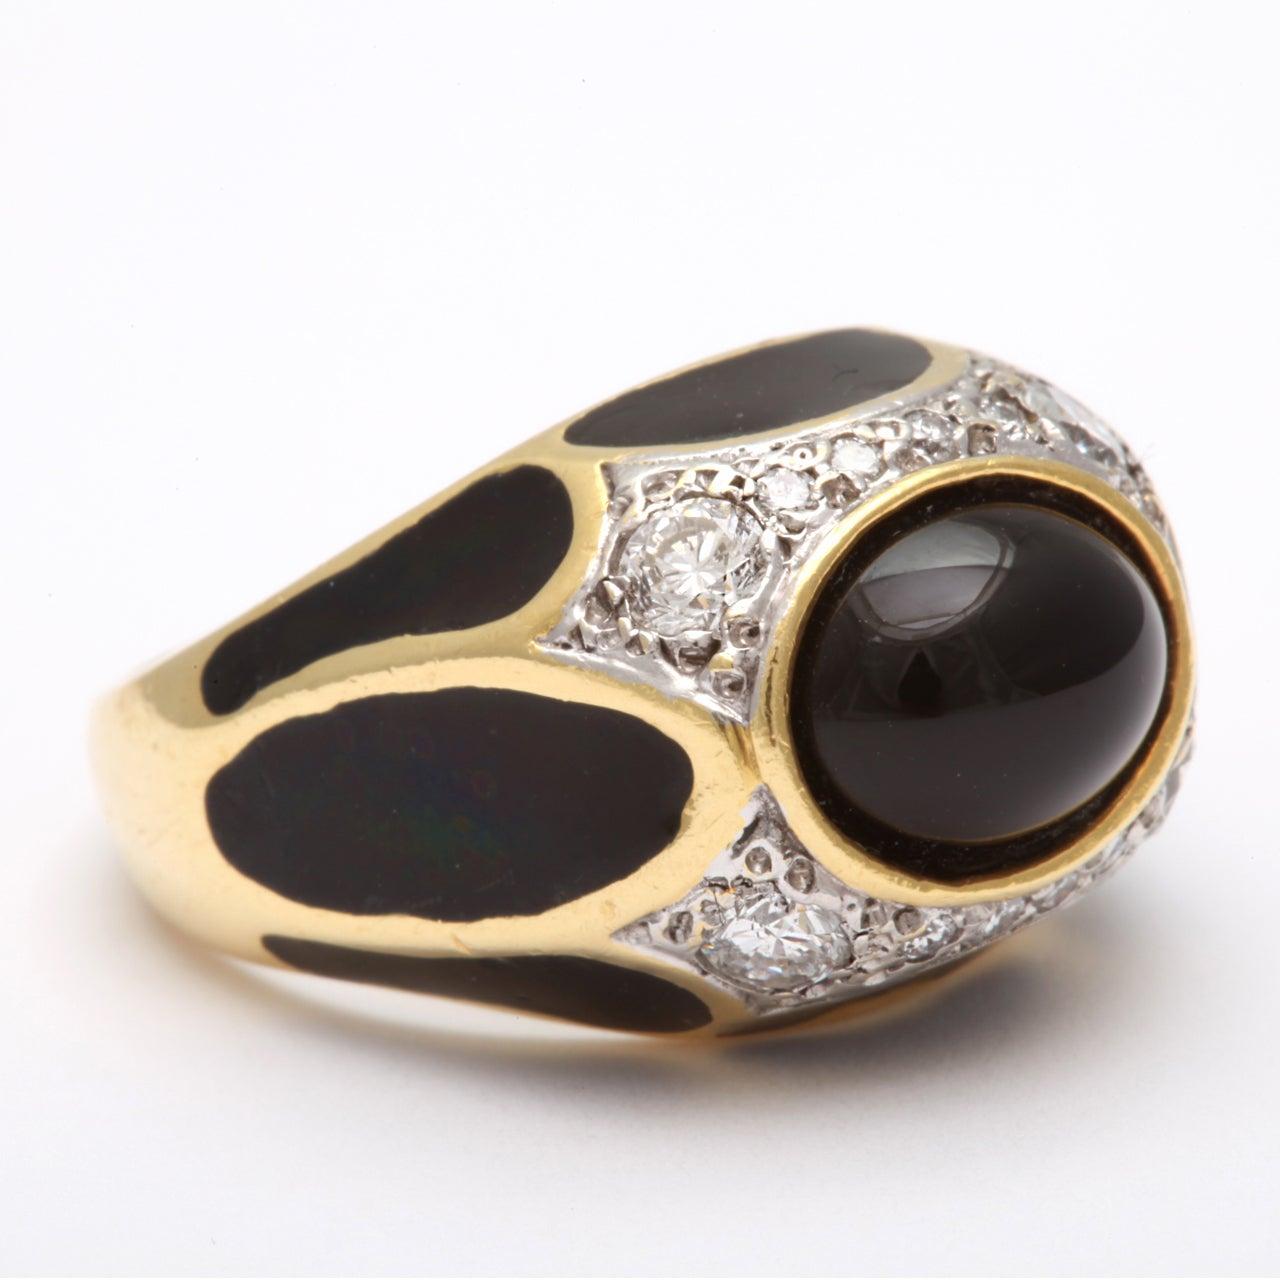 Black Enamel yx Diamond Ring For Sale at 1stdibs